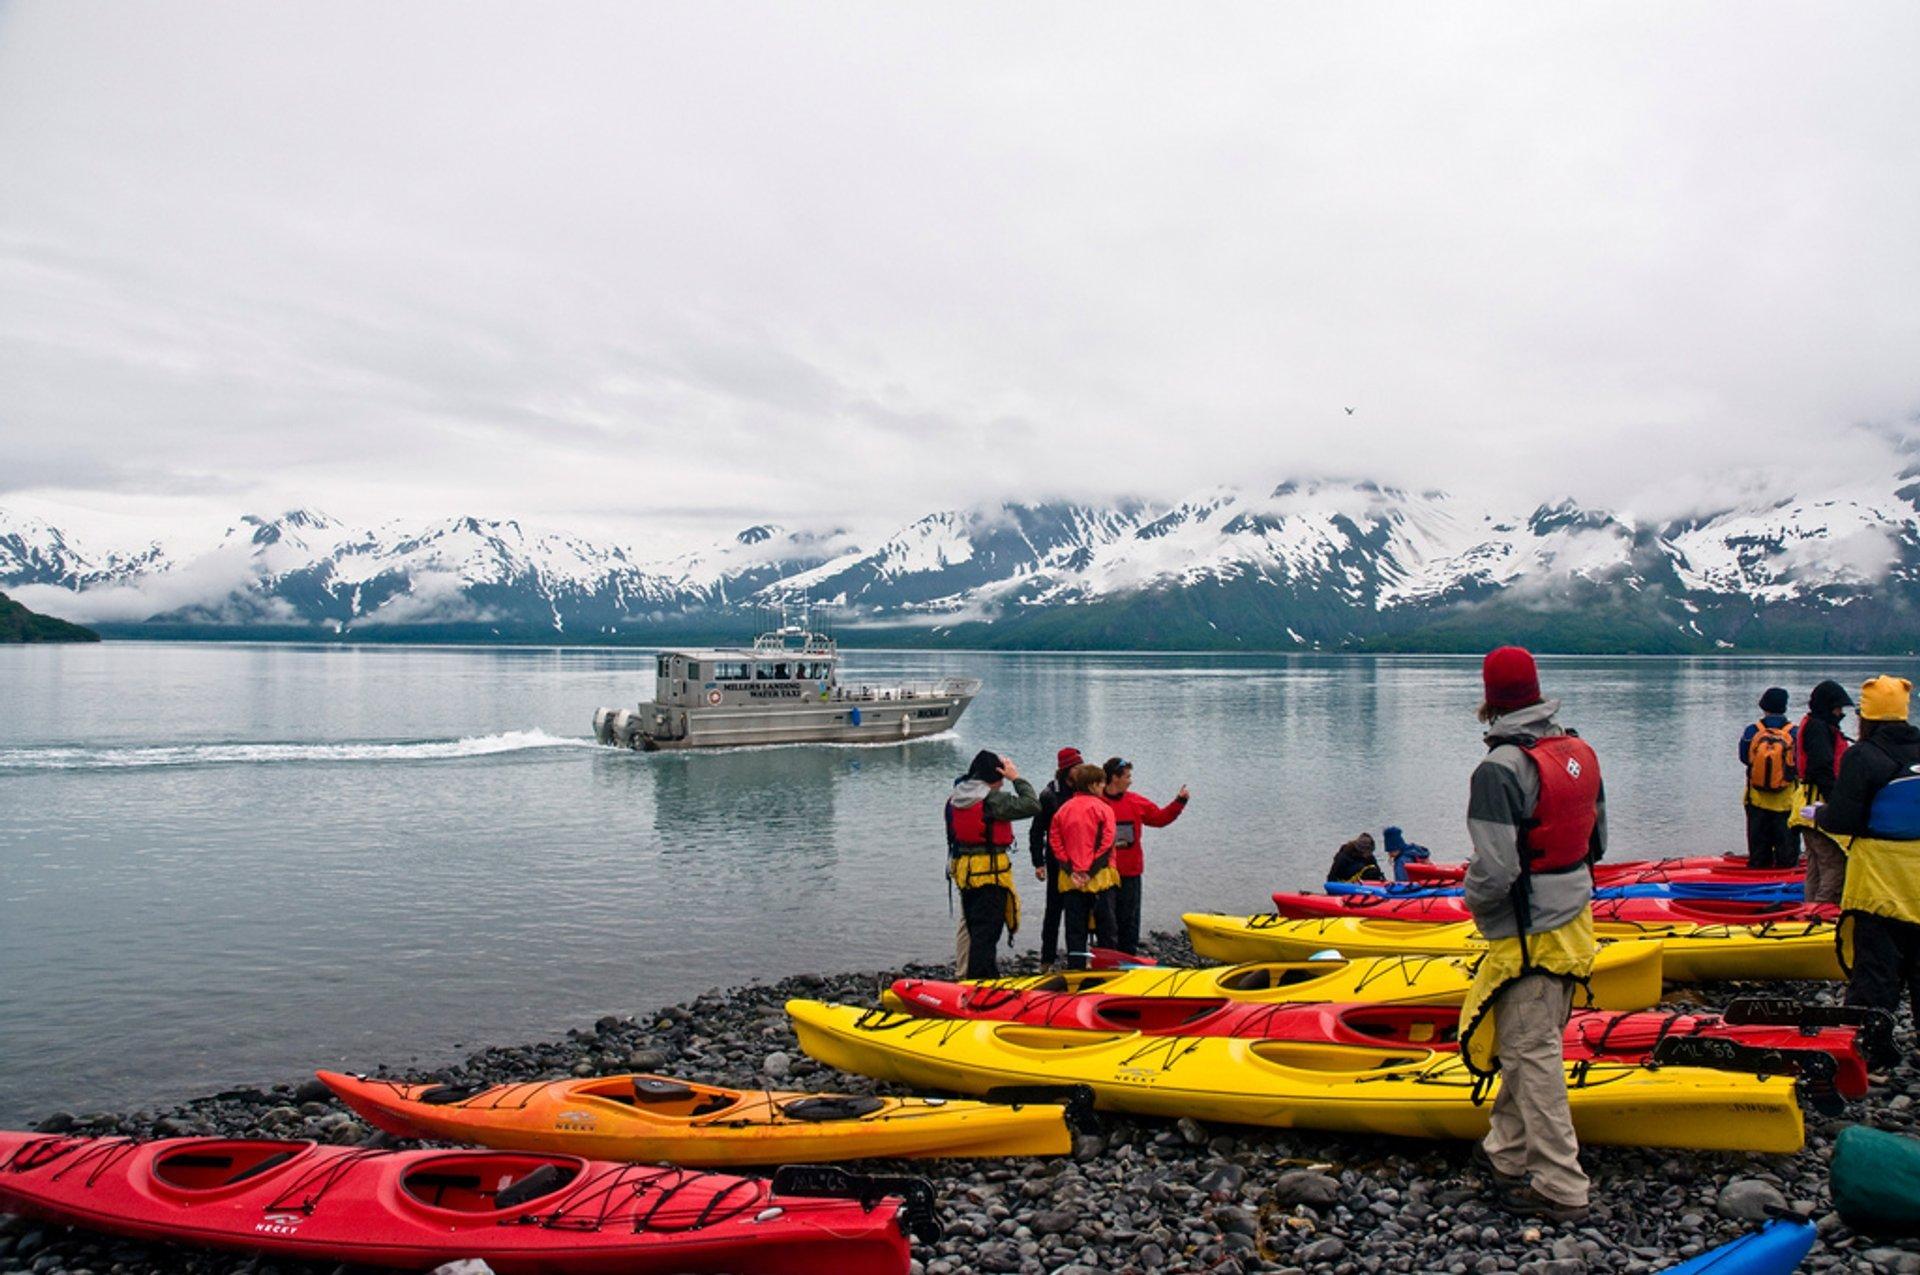 Aialik Bay, Kenai Fjords National Park, Seward, Alaska 2019